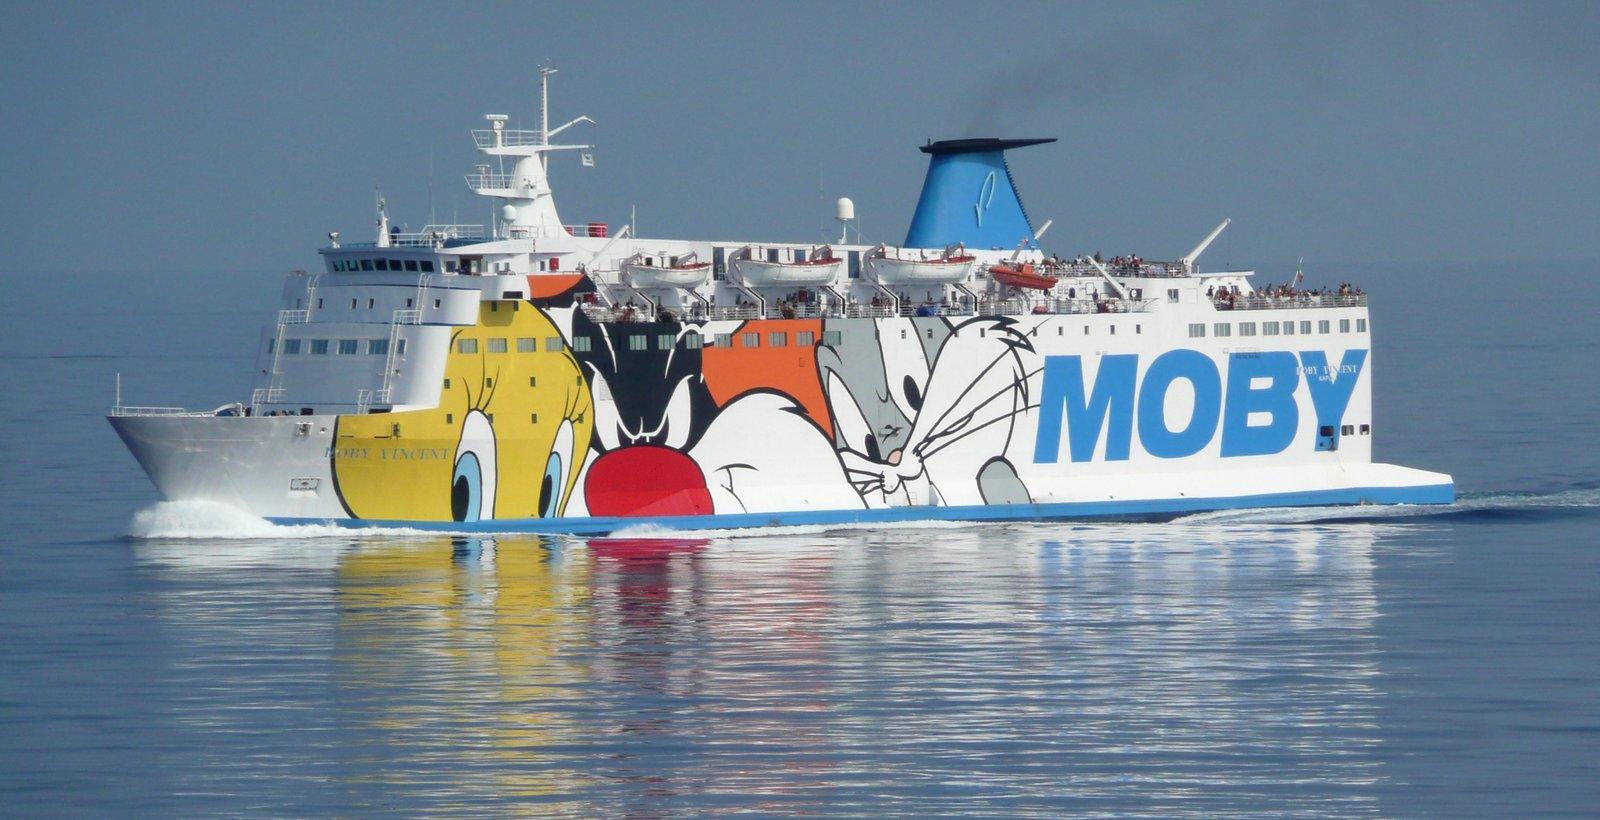 Le Moby Vincent en mer, en juillet 2013